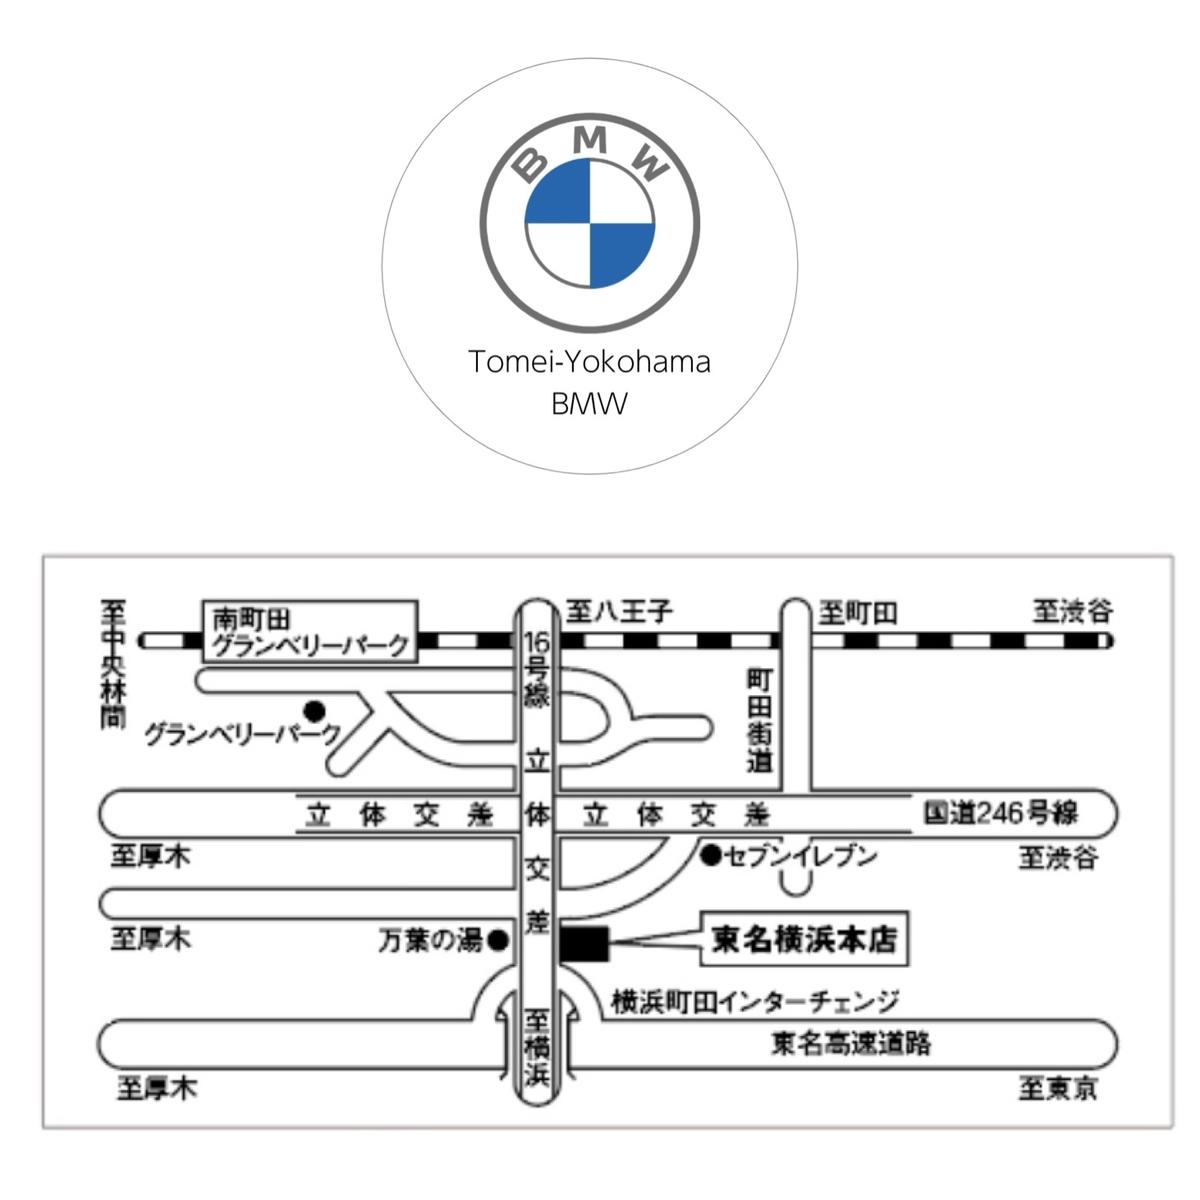 f:id:tomeiyokohama-bmw-mini:20210505123910j:plain